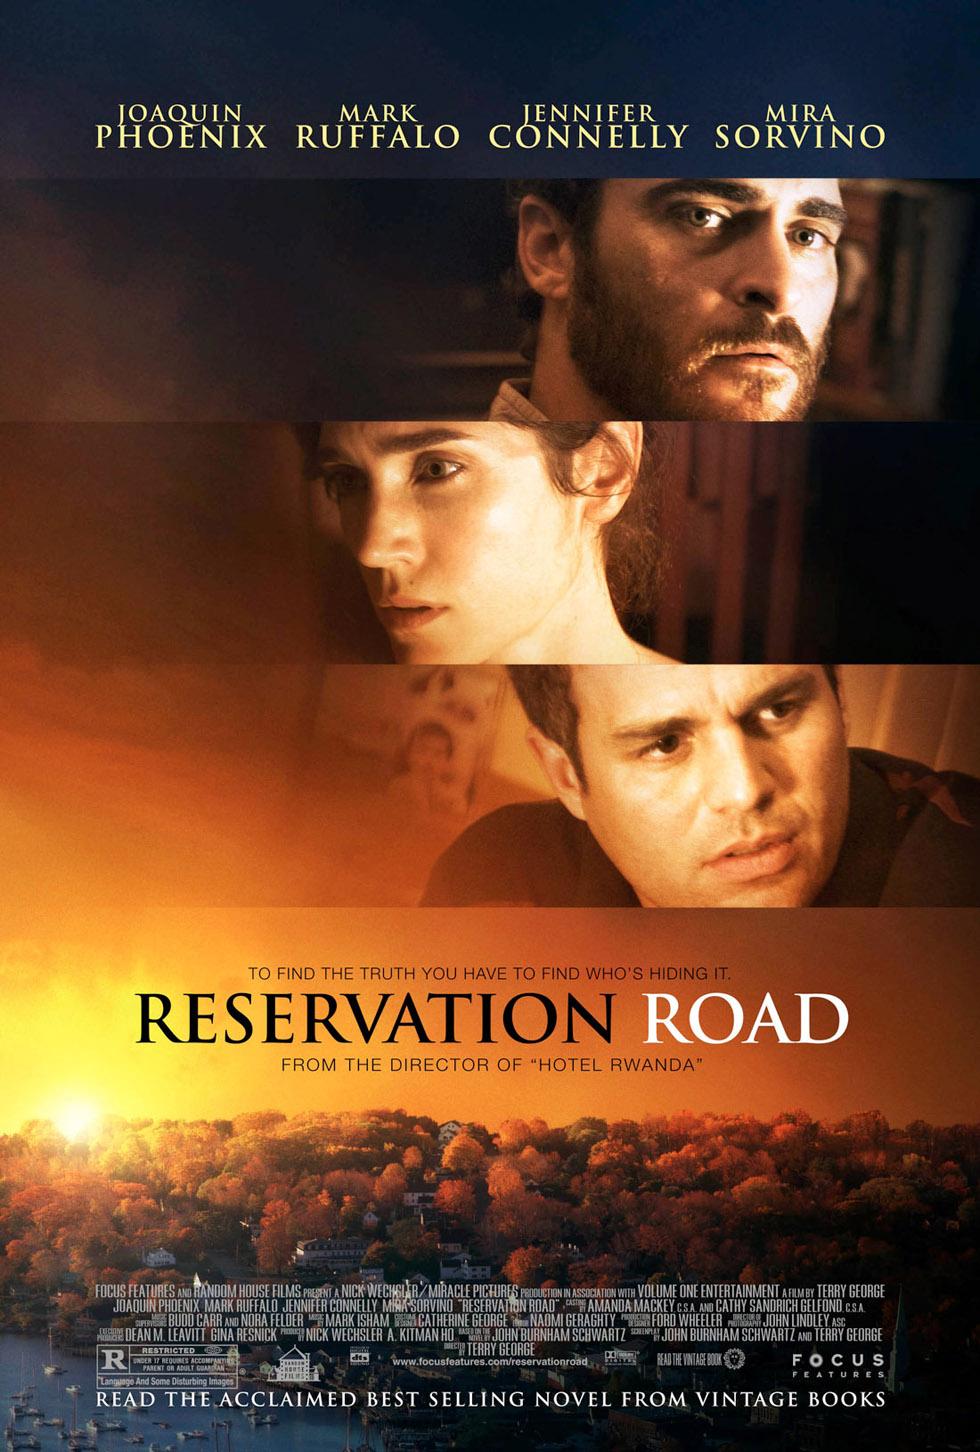 LEMTINGASIS KELIAS (2007) / RESERVATION ROAD